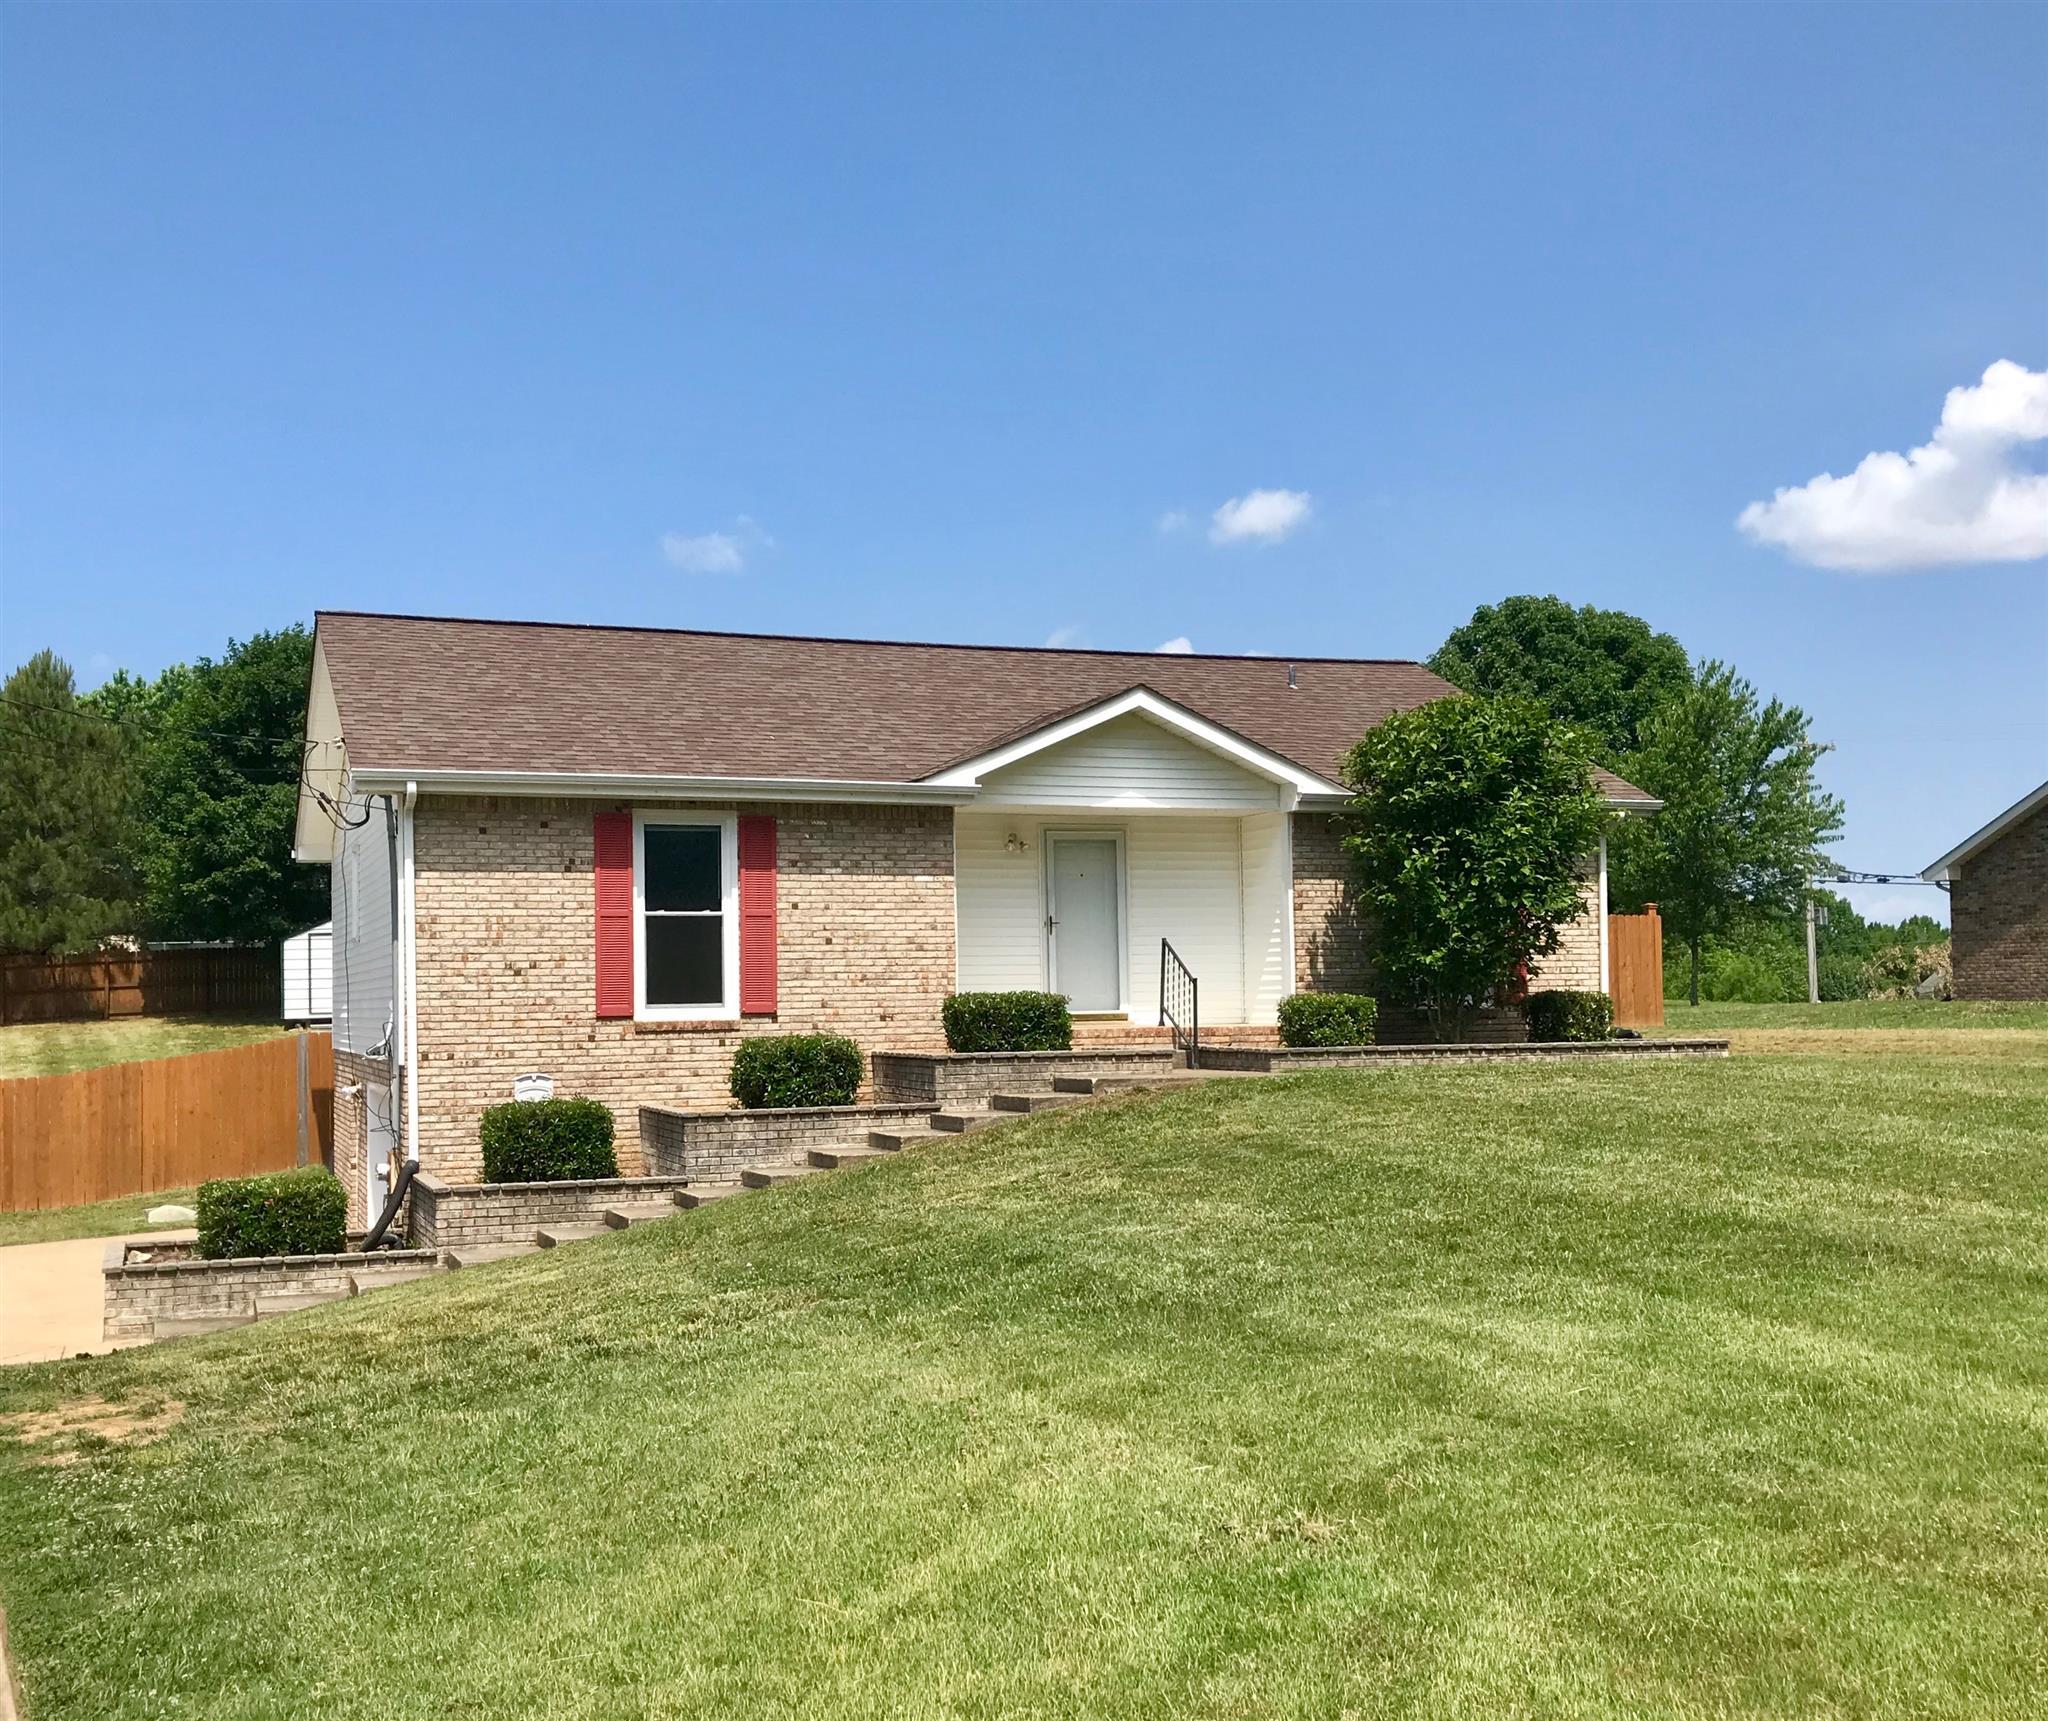 728 N Woodson, Clarksville, TN 37043 - Clarksville, TN real estate listing